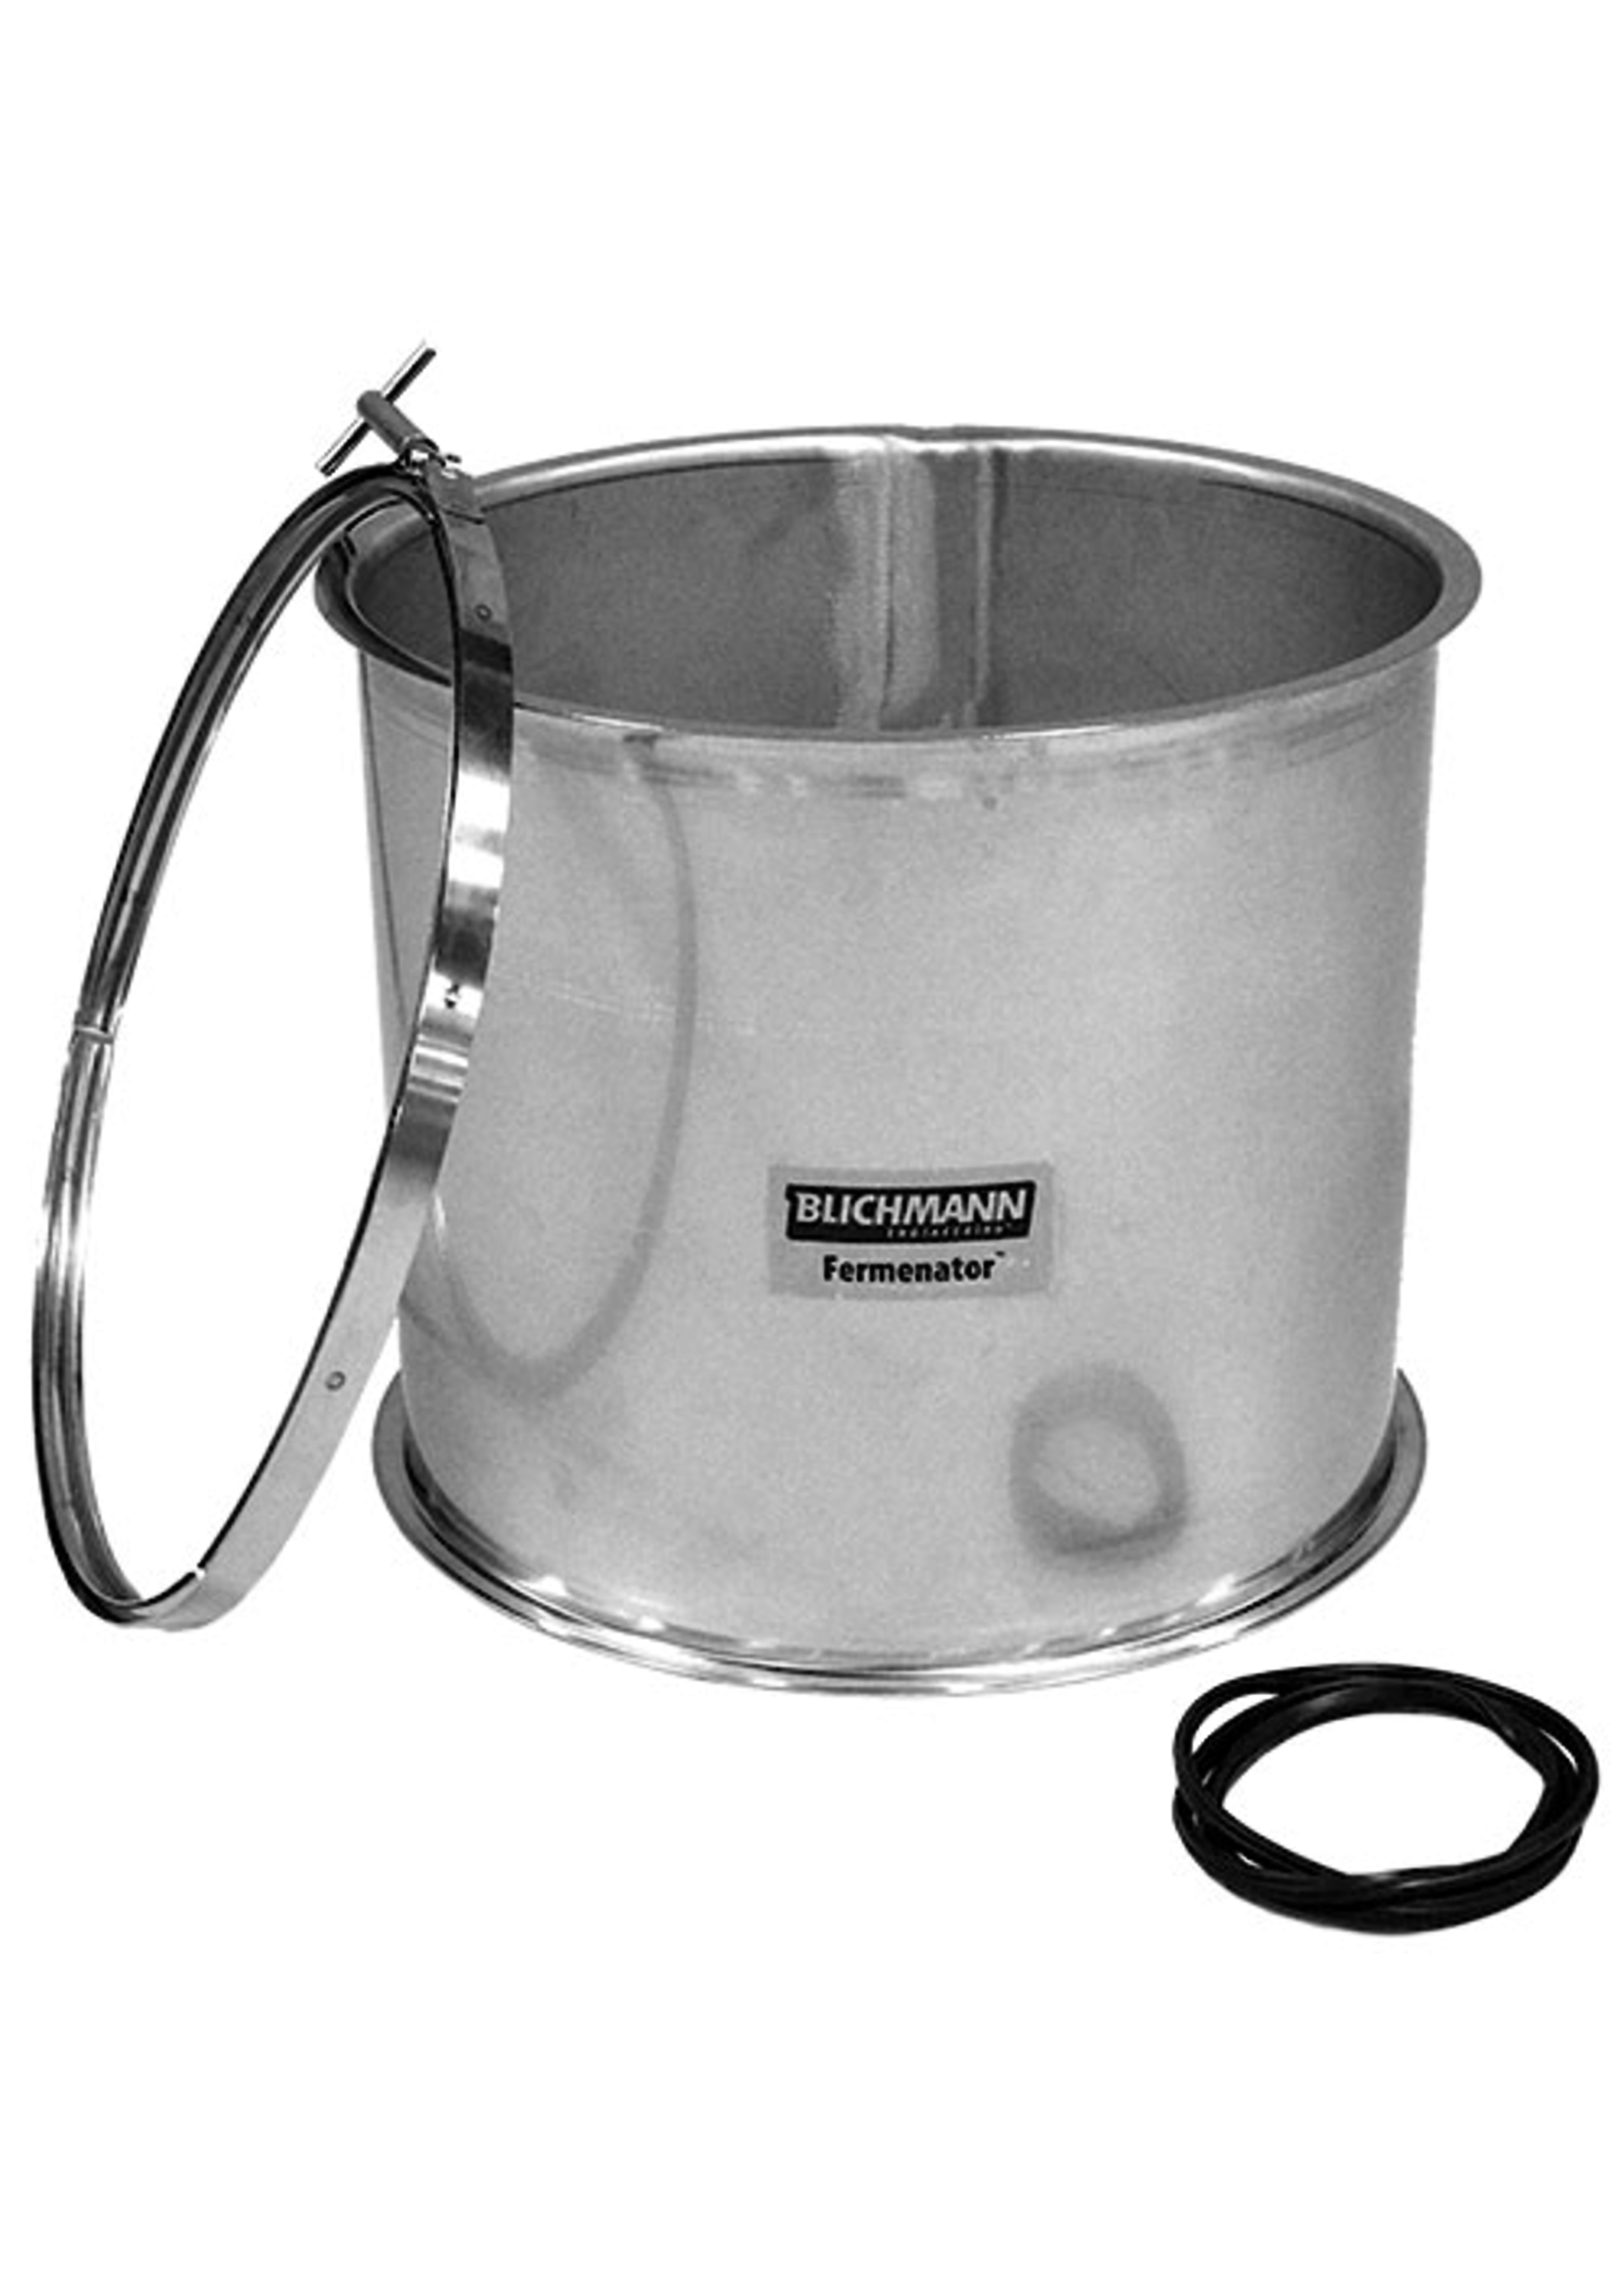 Blichmann Blichmann Fermenator - Capacity Extension for 14.5 Gallon Conical (26 Gallon Gross)